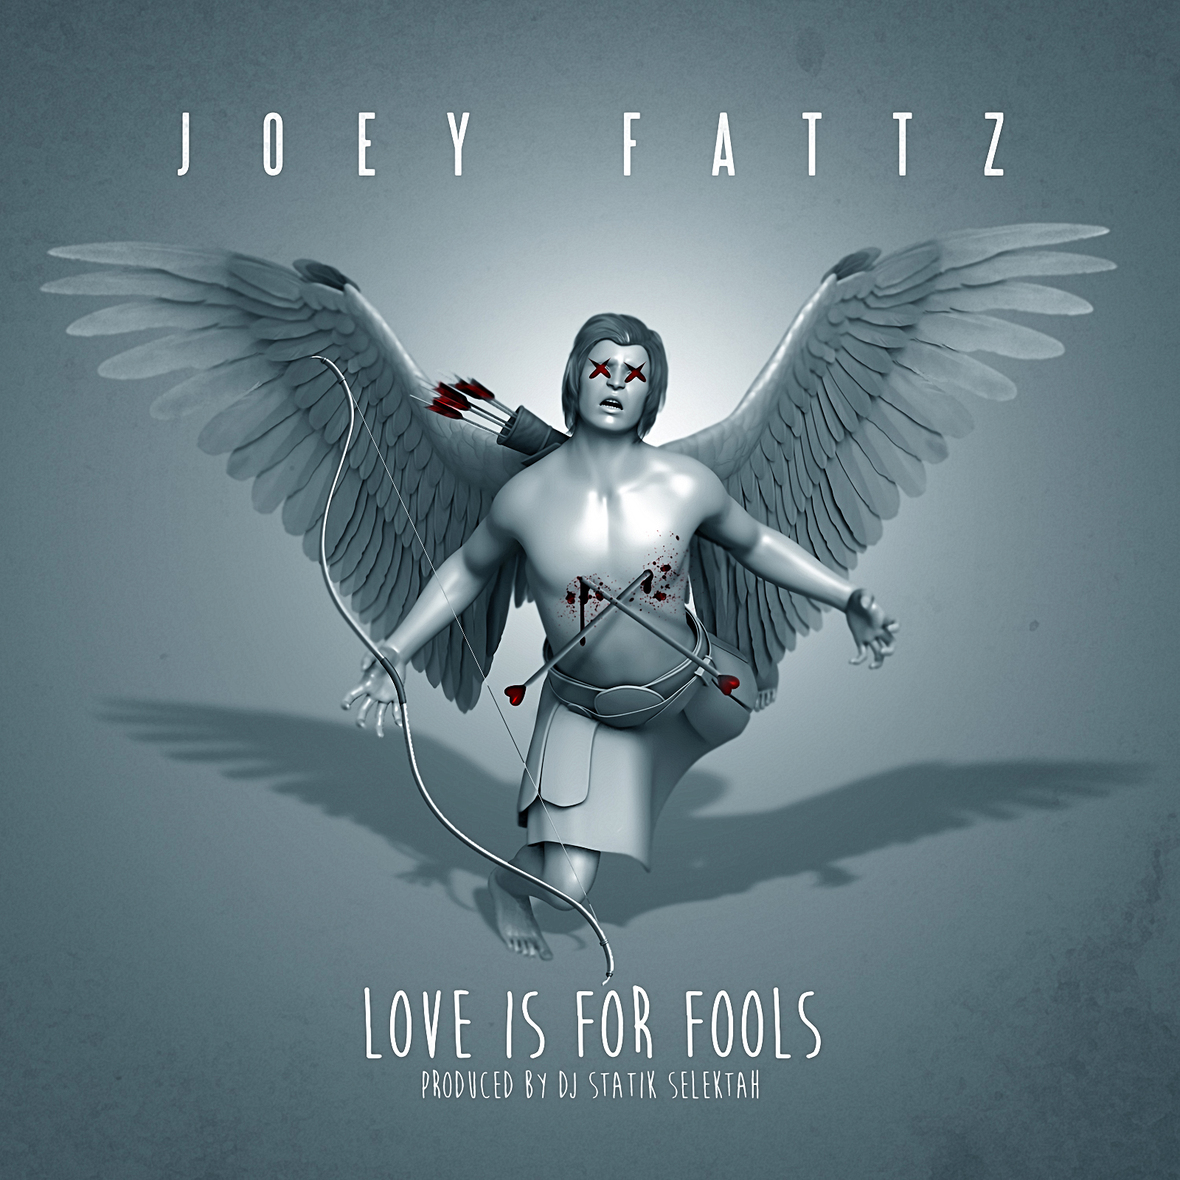 Joey Fattz